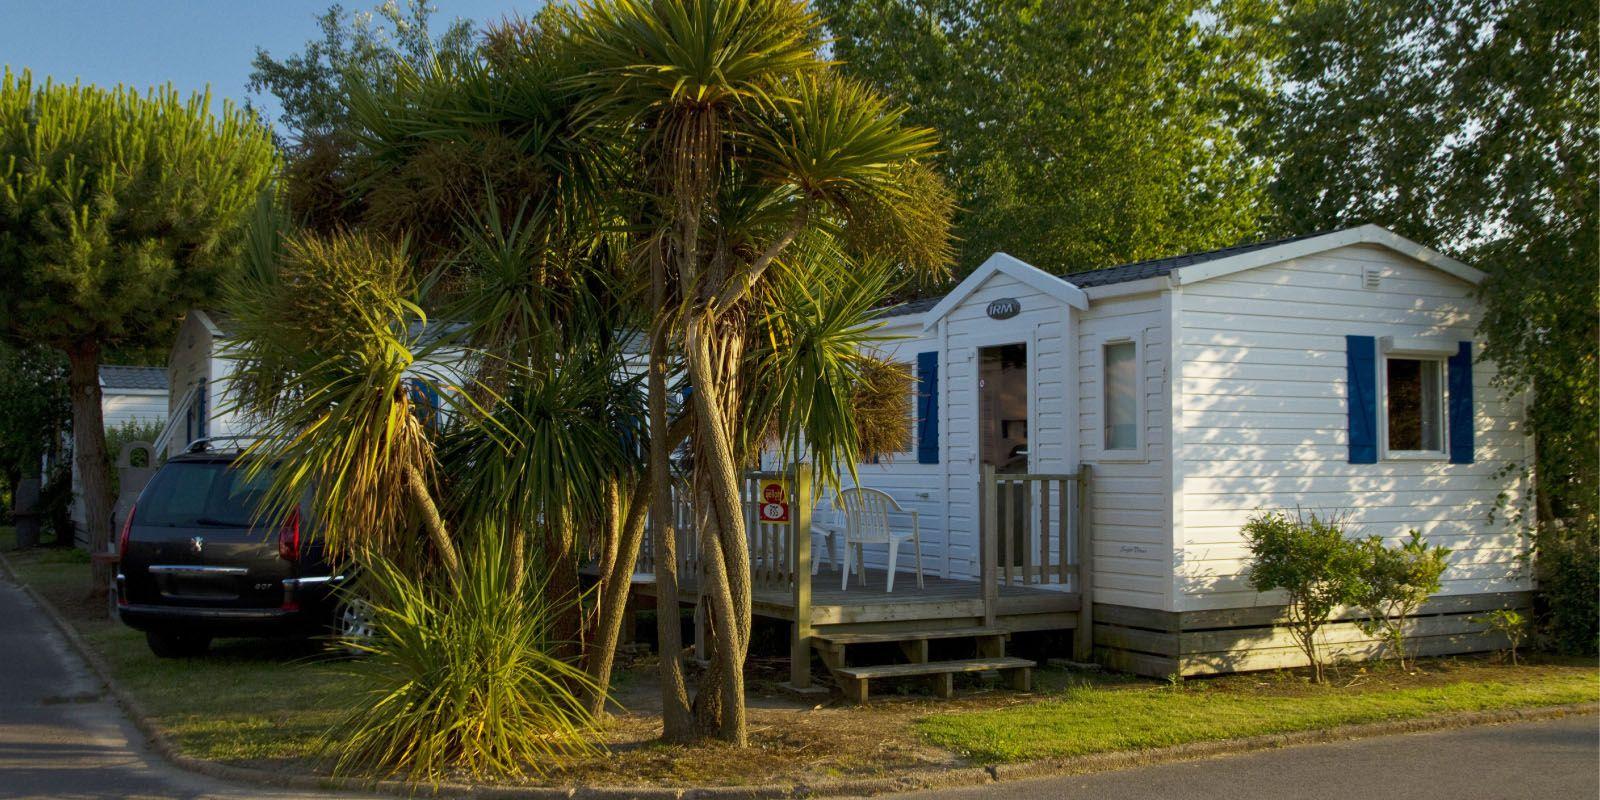 Lodge 4 personnes - 24 m² - emplacement